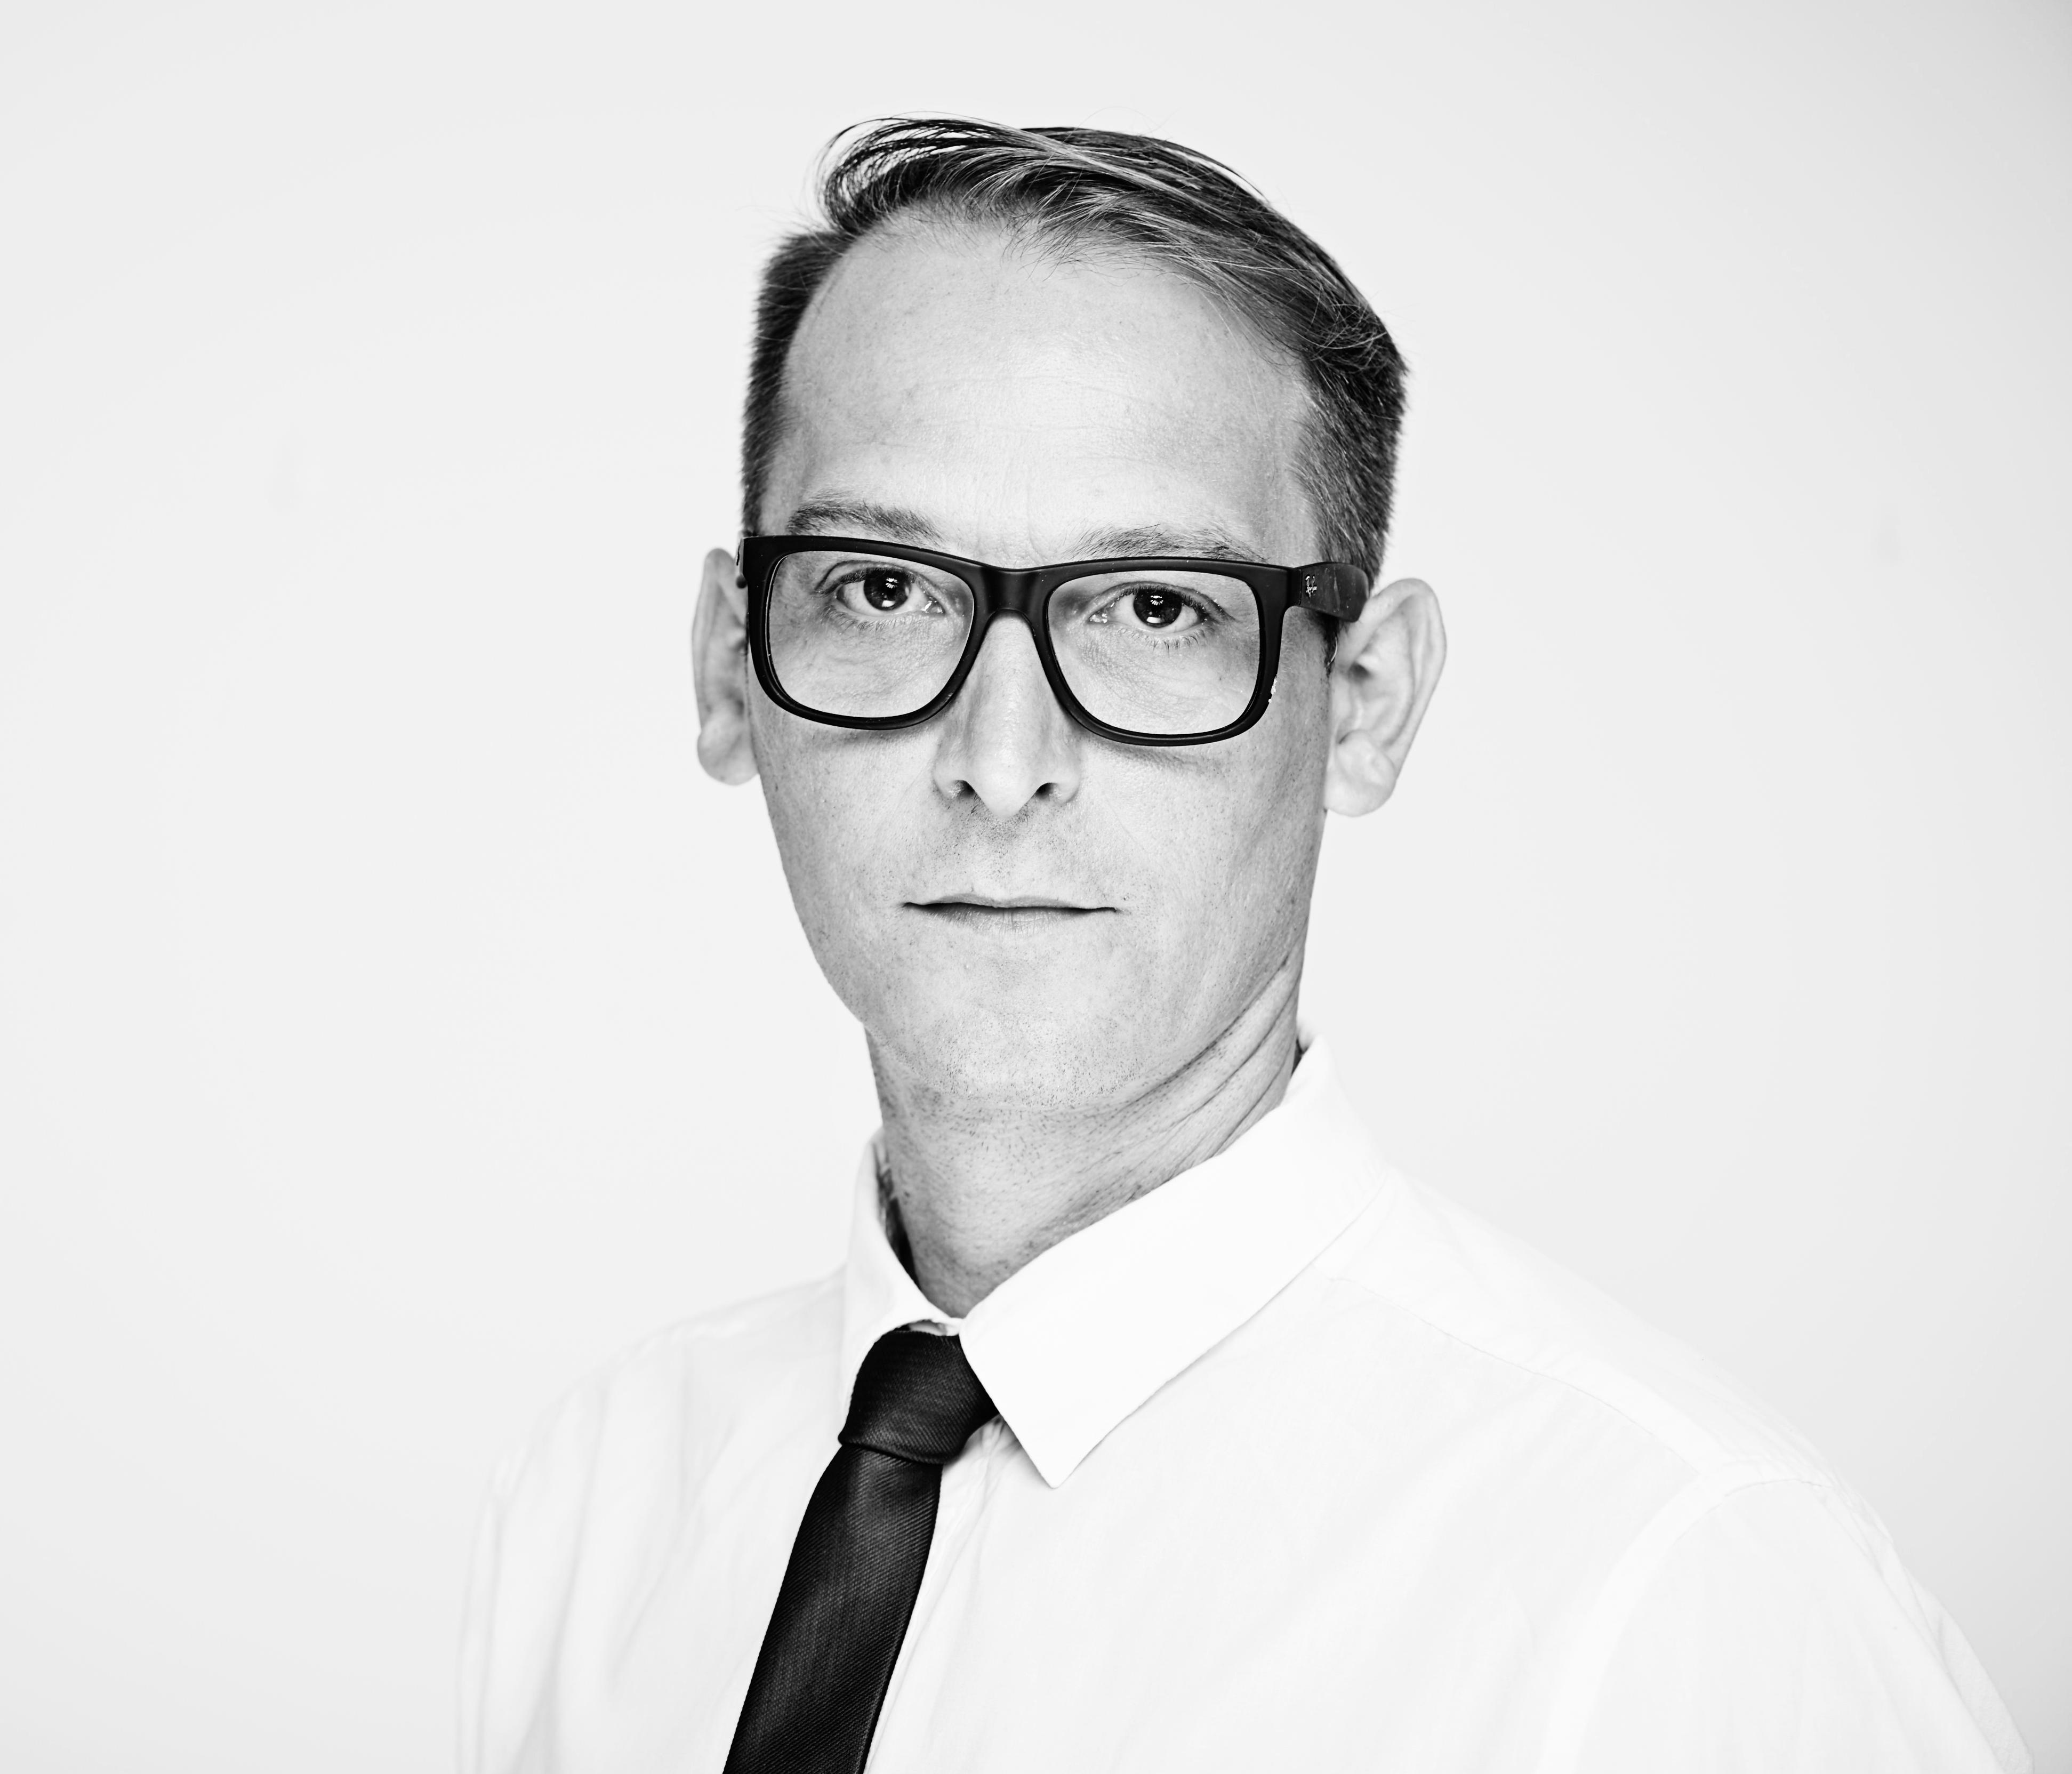 Rechtsanwalt Marcel Sonnenberg